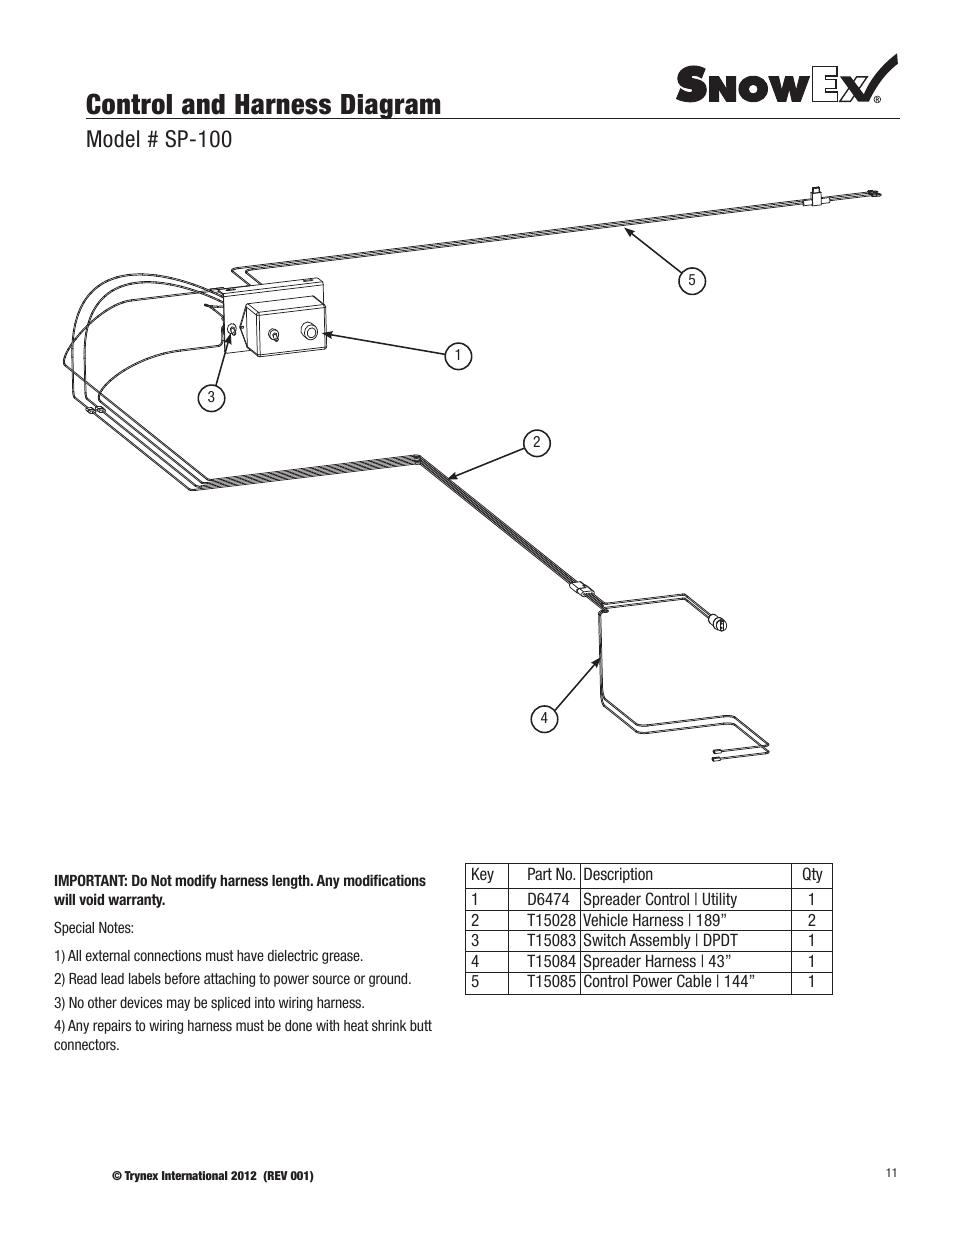 snowex d6230 wiring diagram wiring diagram electrical connections diagrams snowex sr110 wiring diagram wiring diagram h8snowex wiring diagram 2500 wiring diagram snowex d6230 wiring diagram